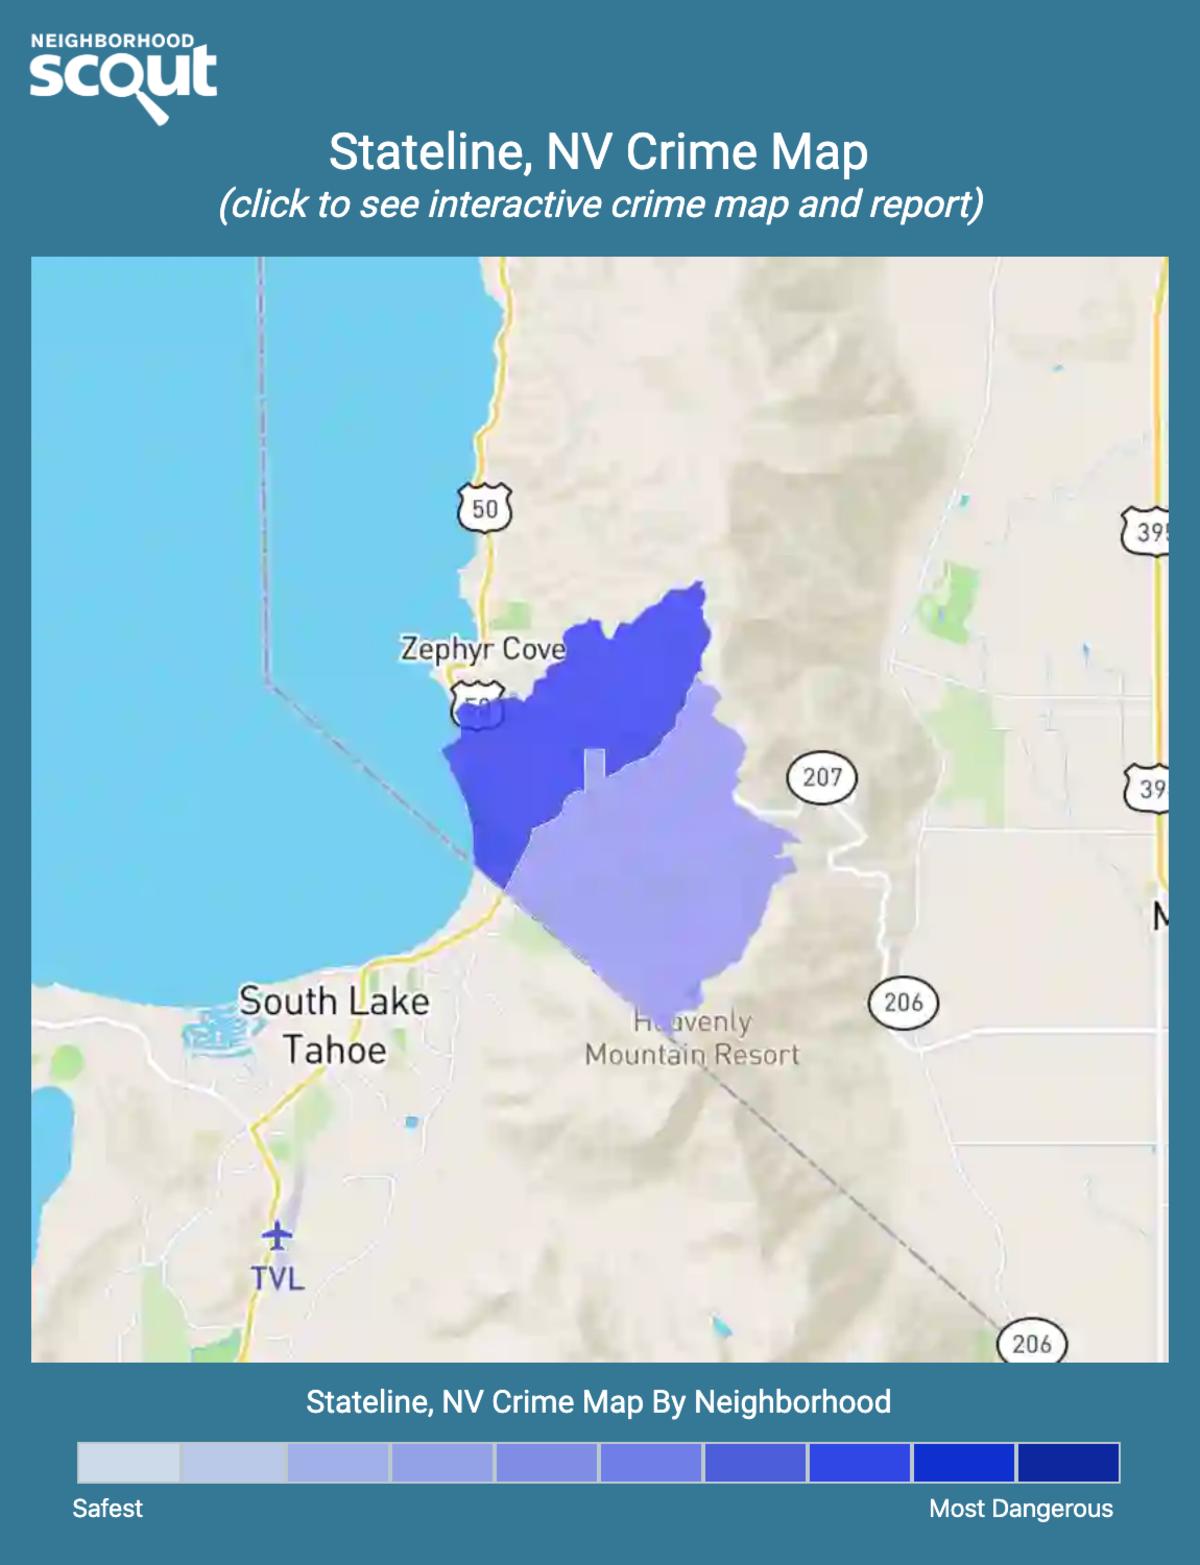 Stateline, Nevada crime map